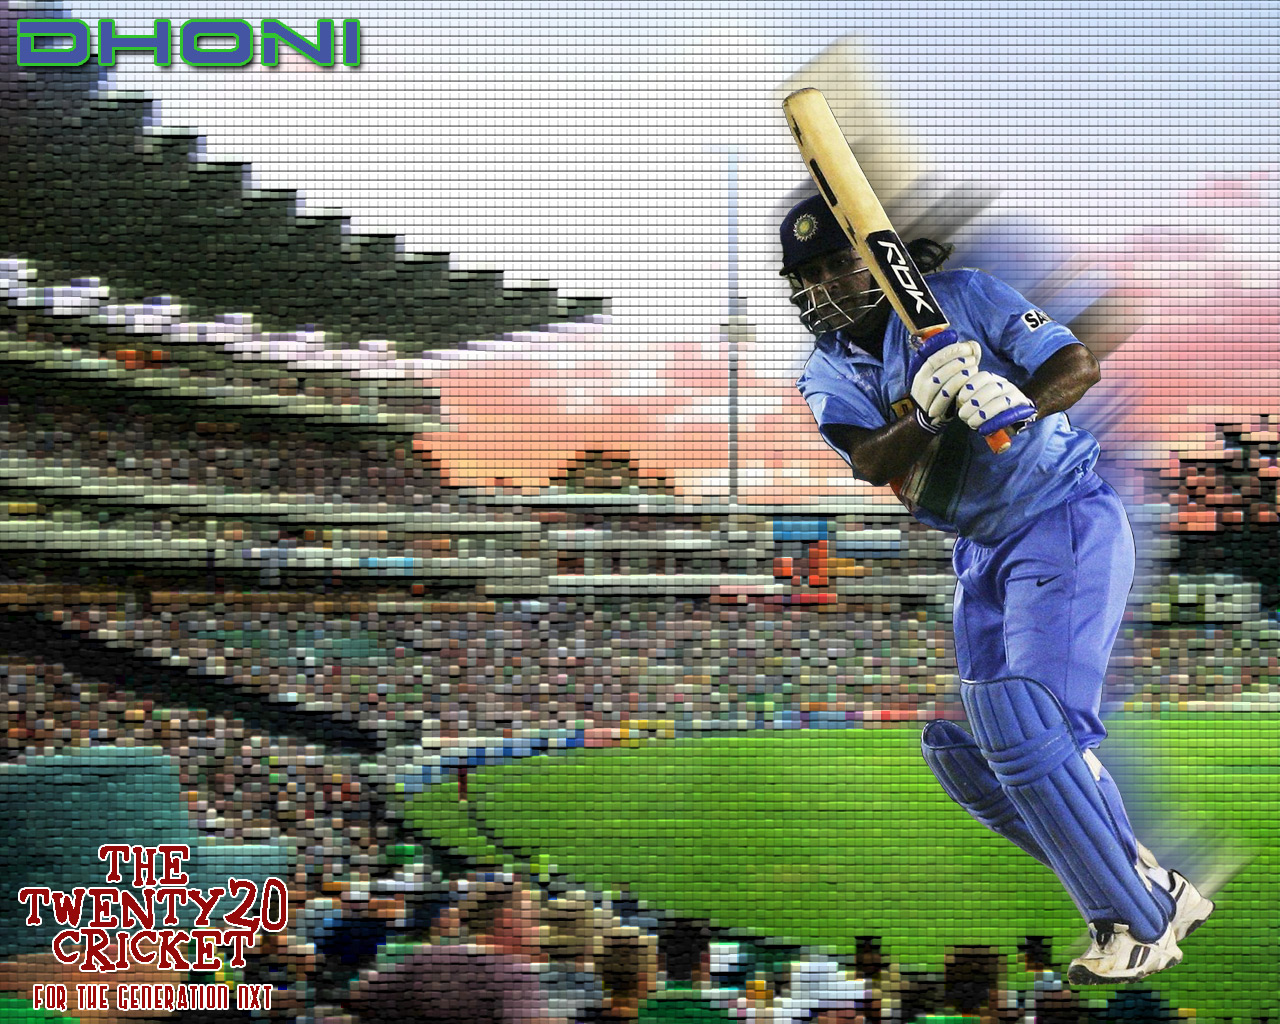 http://2.bp.blogspot.com/-oFv5mh1LcPg/UDpXrm_ouRI/AAAAAAAACs8/wfGYVsLk8Rk/s1600/Mahendra-Singh-Dhoni+wallpapers+%2813%29.jpg